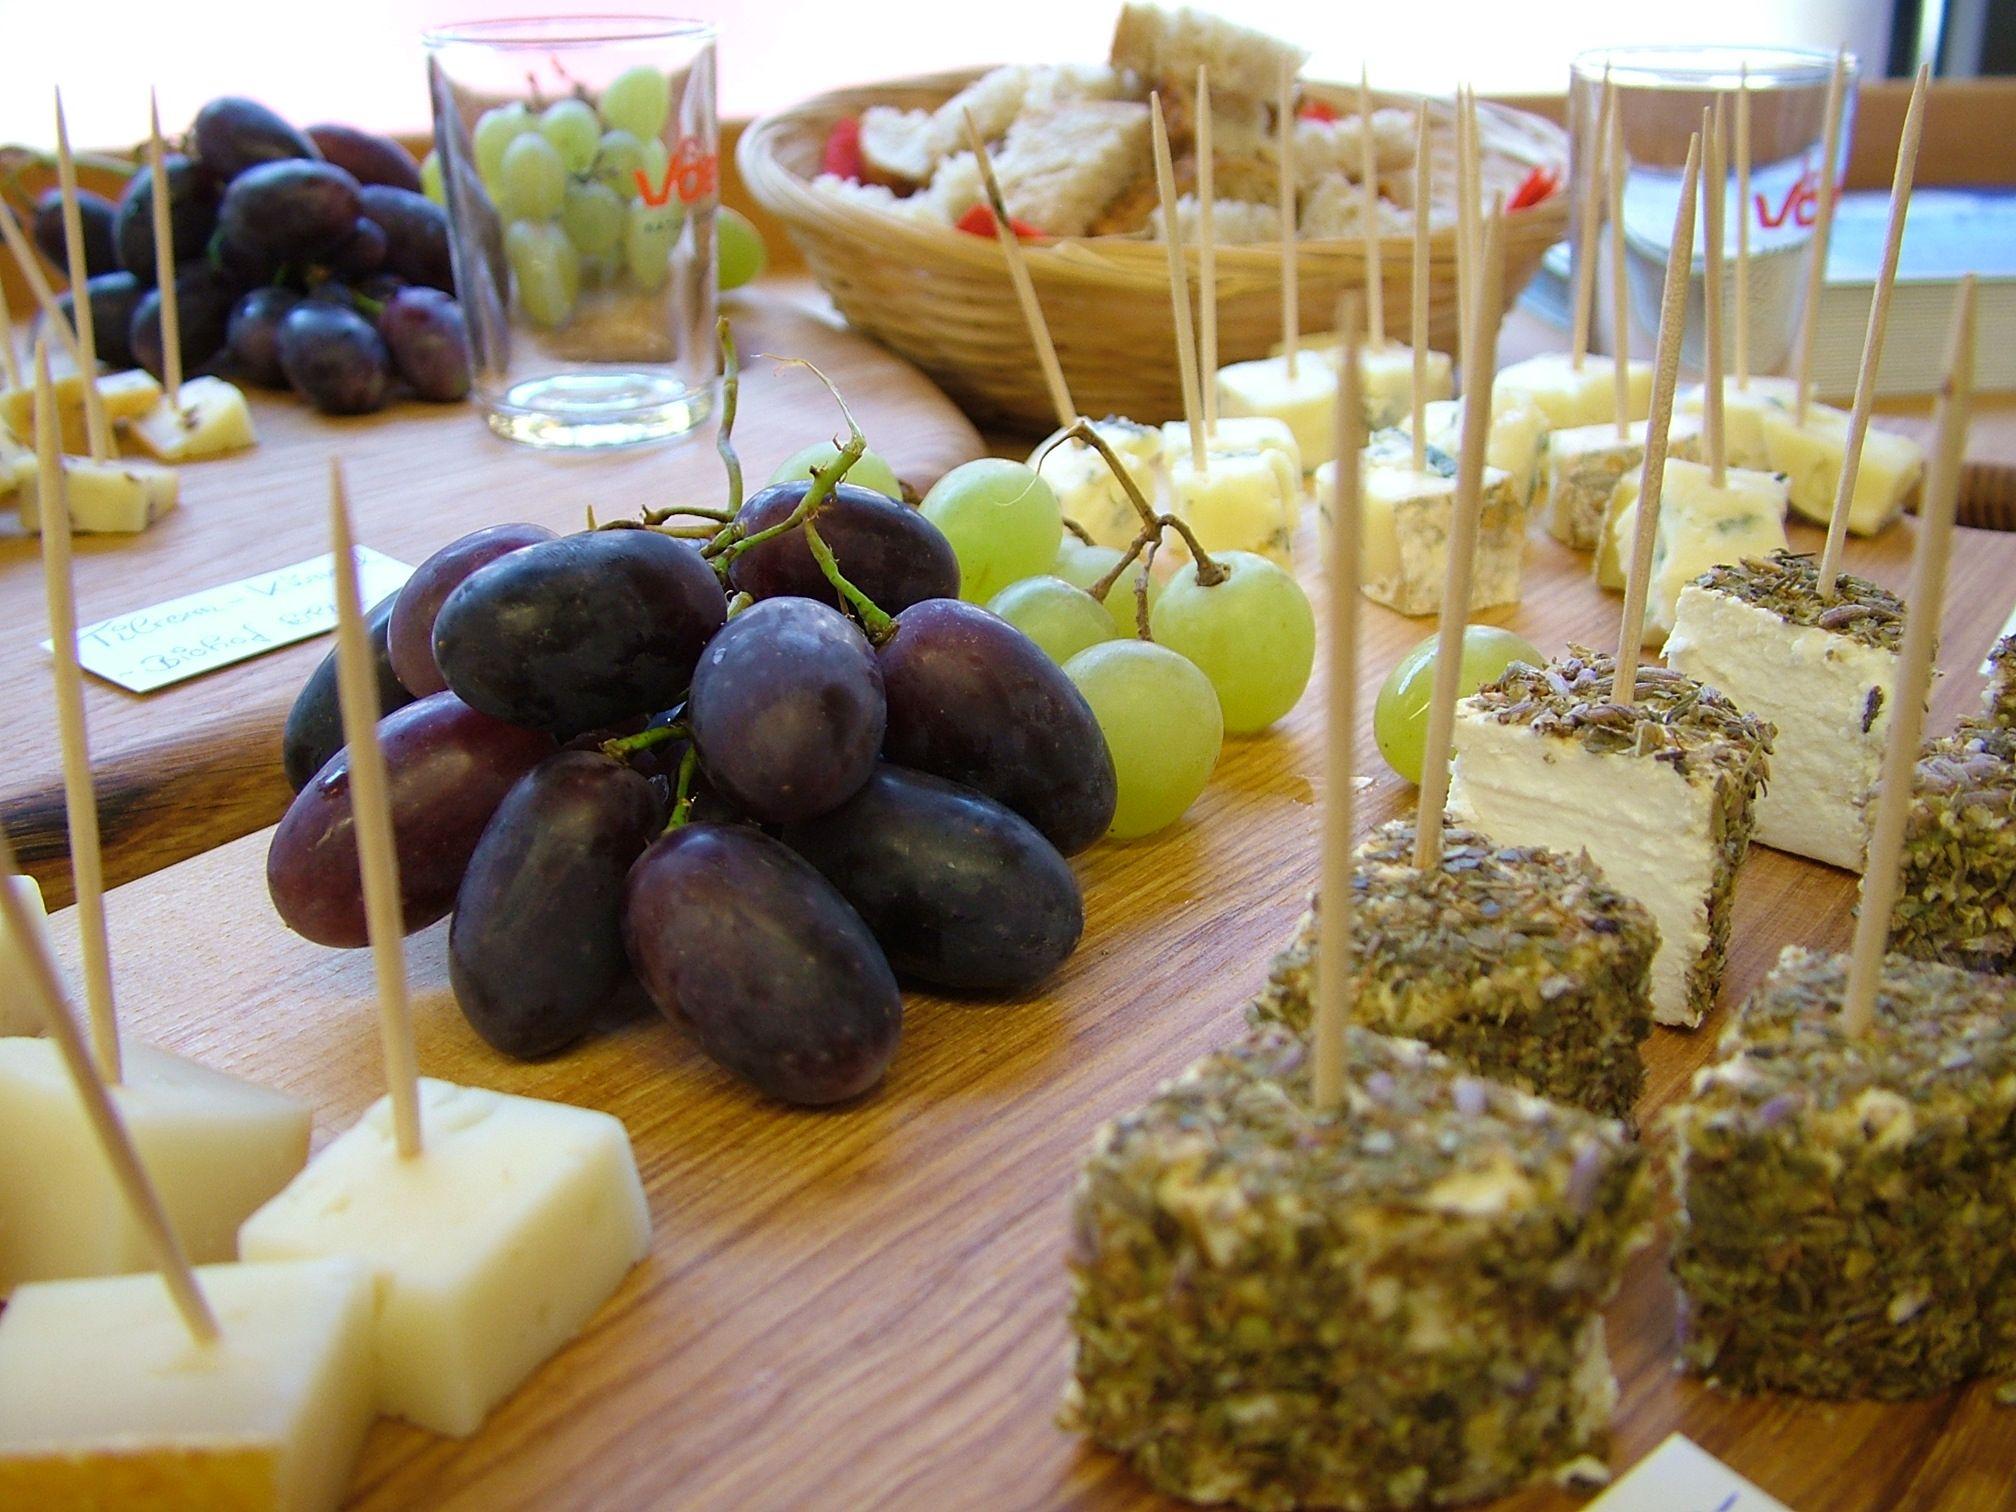 Kleine leckere Häppchen | #Hannover  #Hanover #Linden #EatTheWorld #EatTheWorldTour #FoodTour #Germany #Deutschland #Blog #FoodBlogger #Travel #Culture #Food